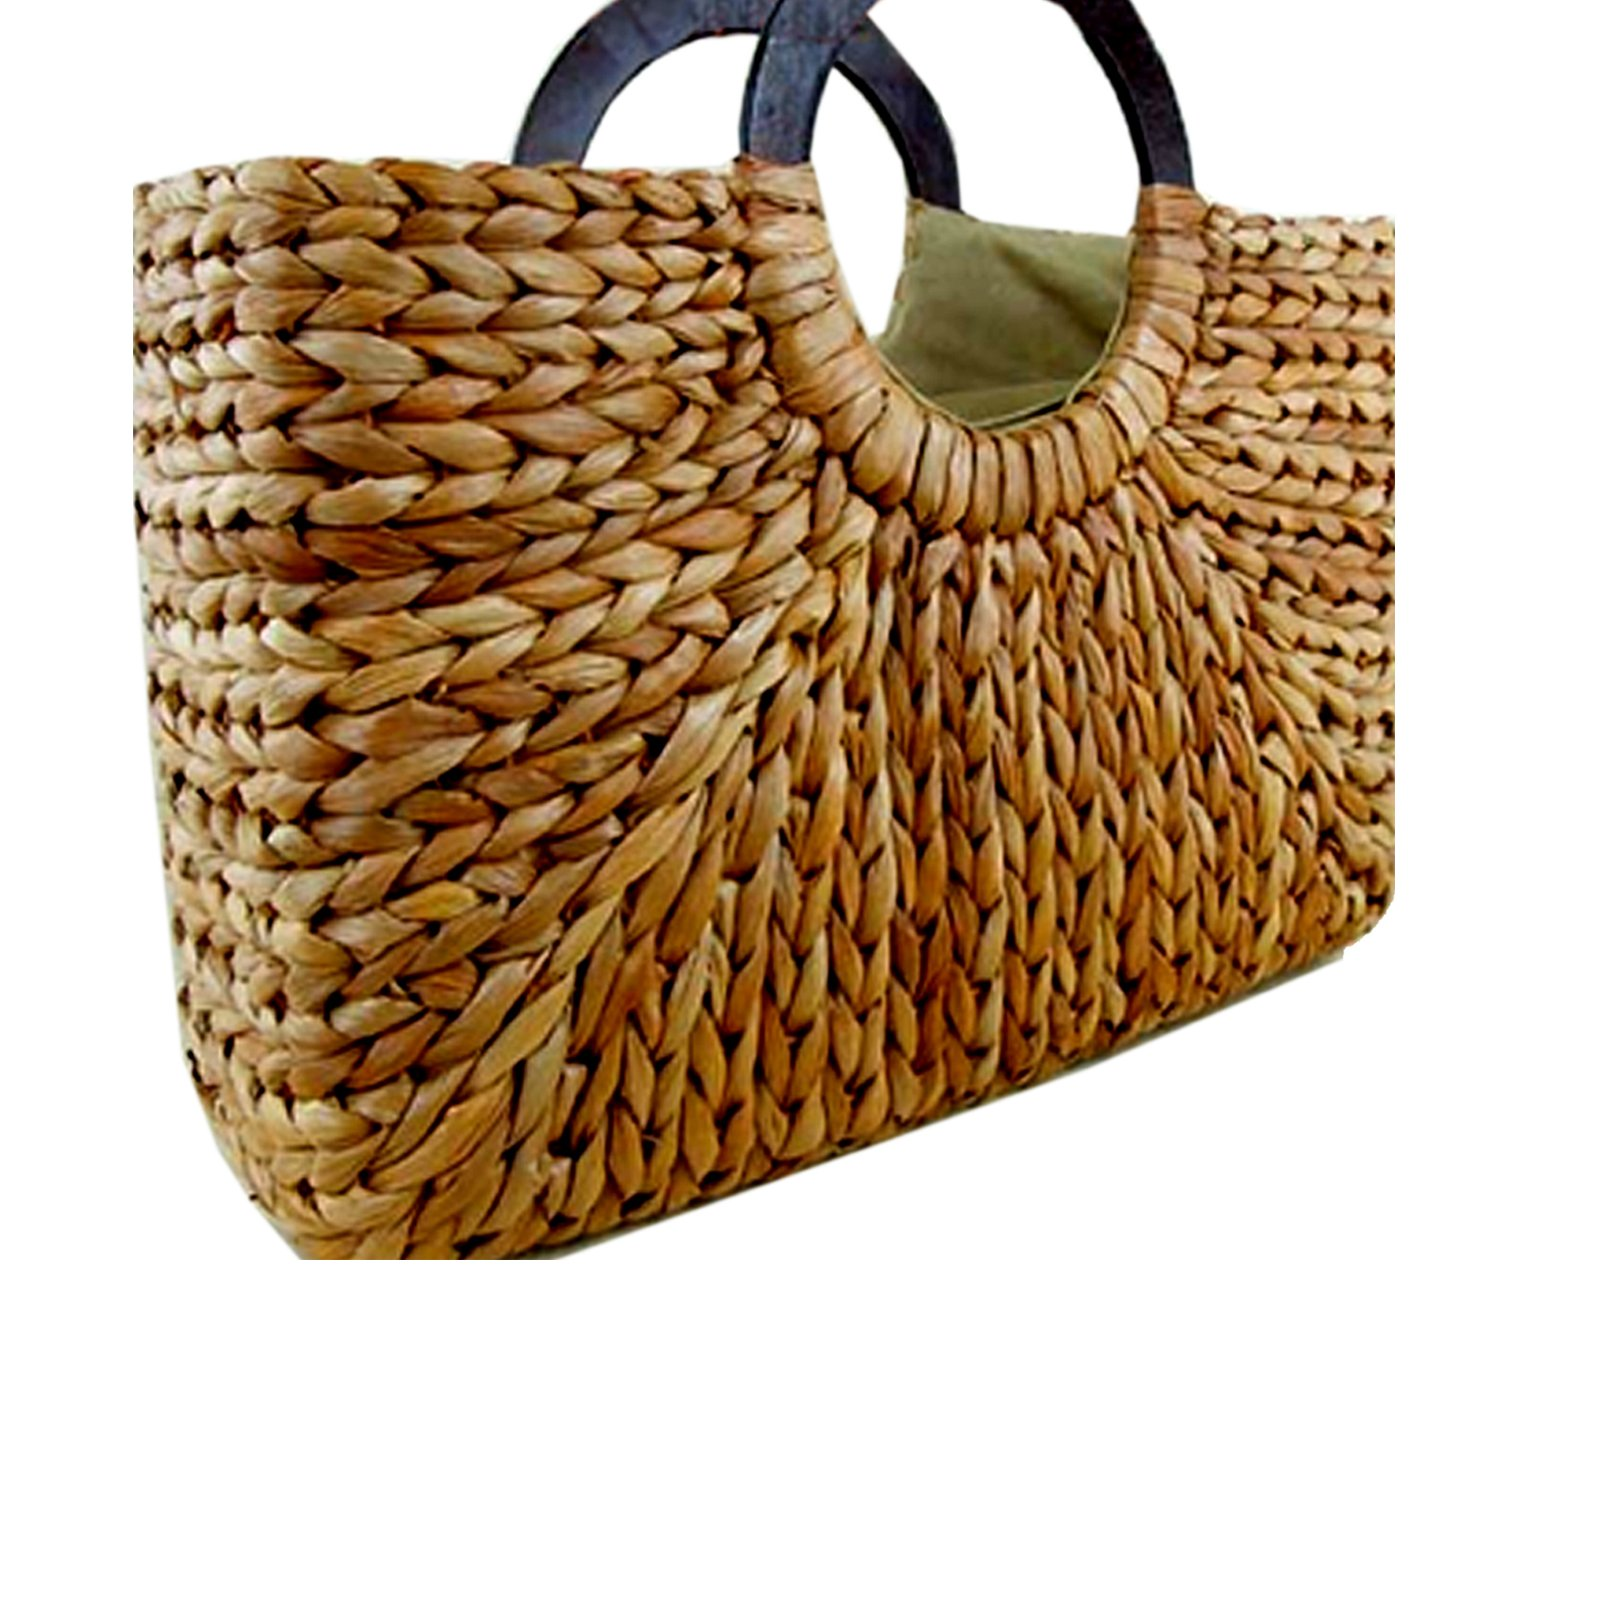 Straw Rattan Women Tote Summer Beach Handbag Picnic Basket Natural Khaki Bag Medium Size 15.5'x15' US Seller (Natural)